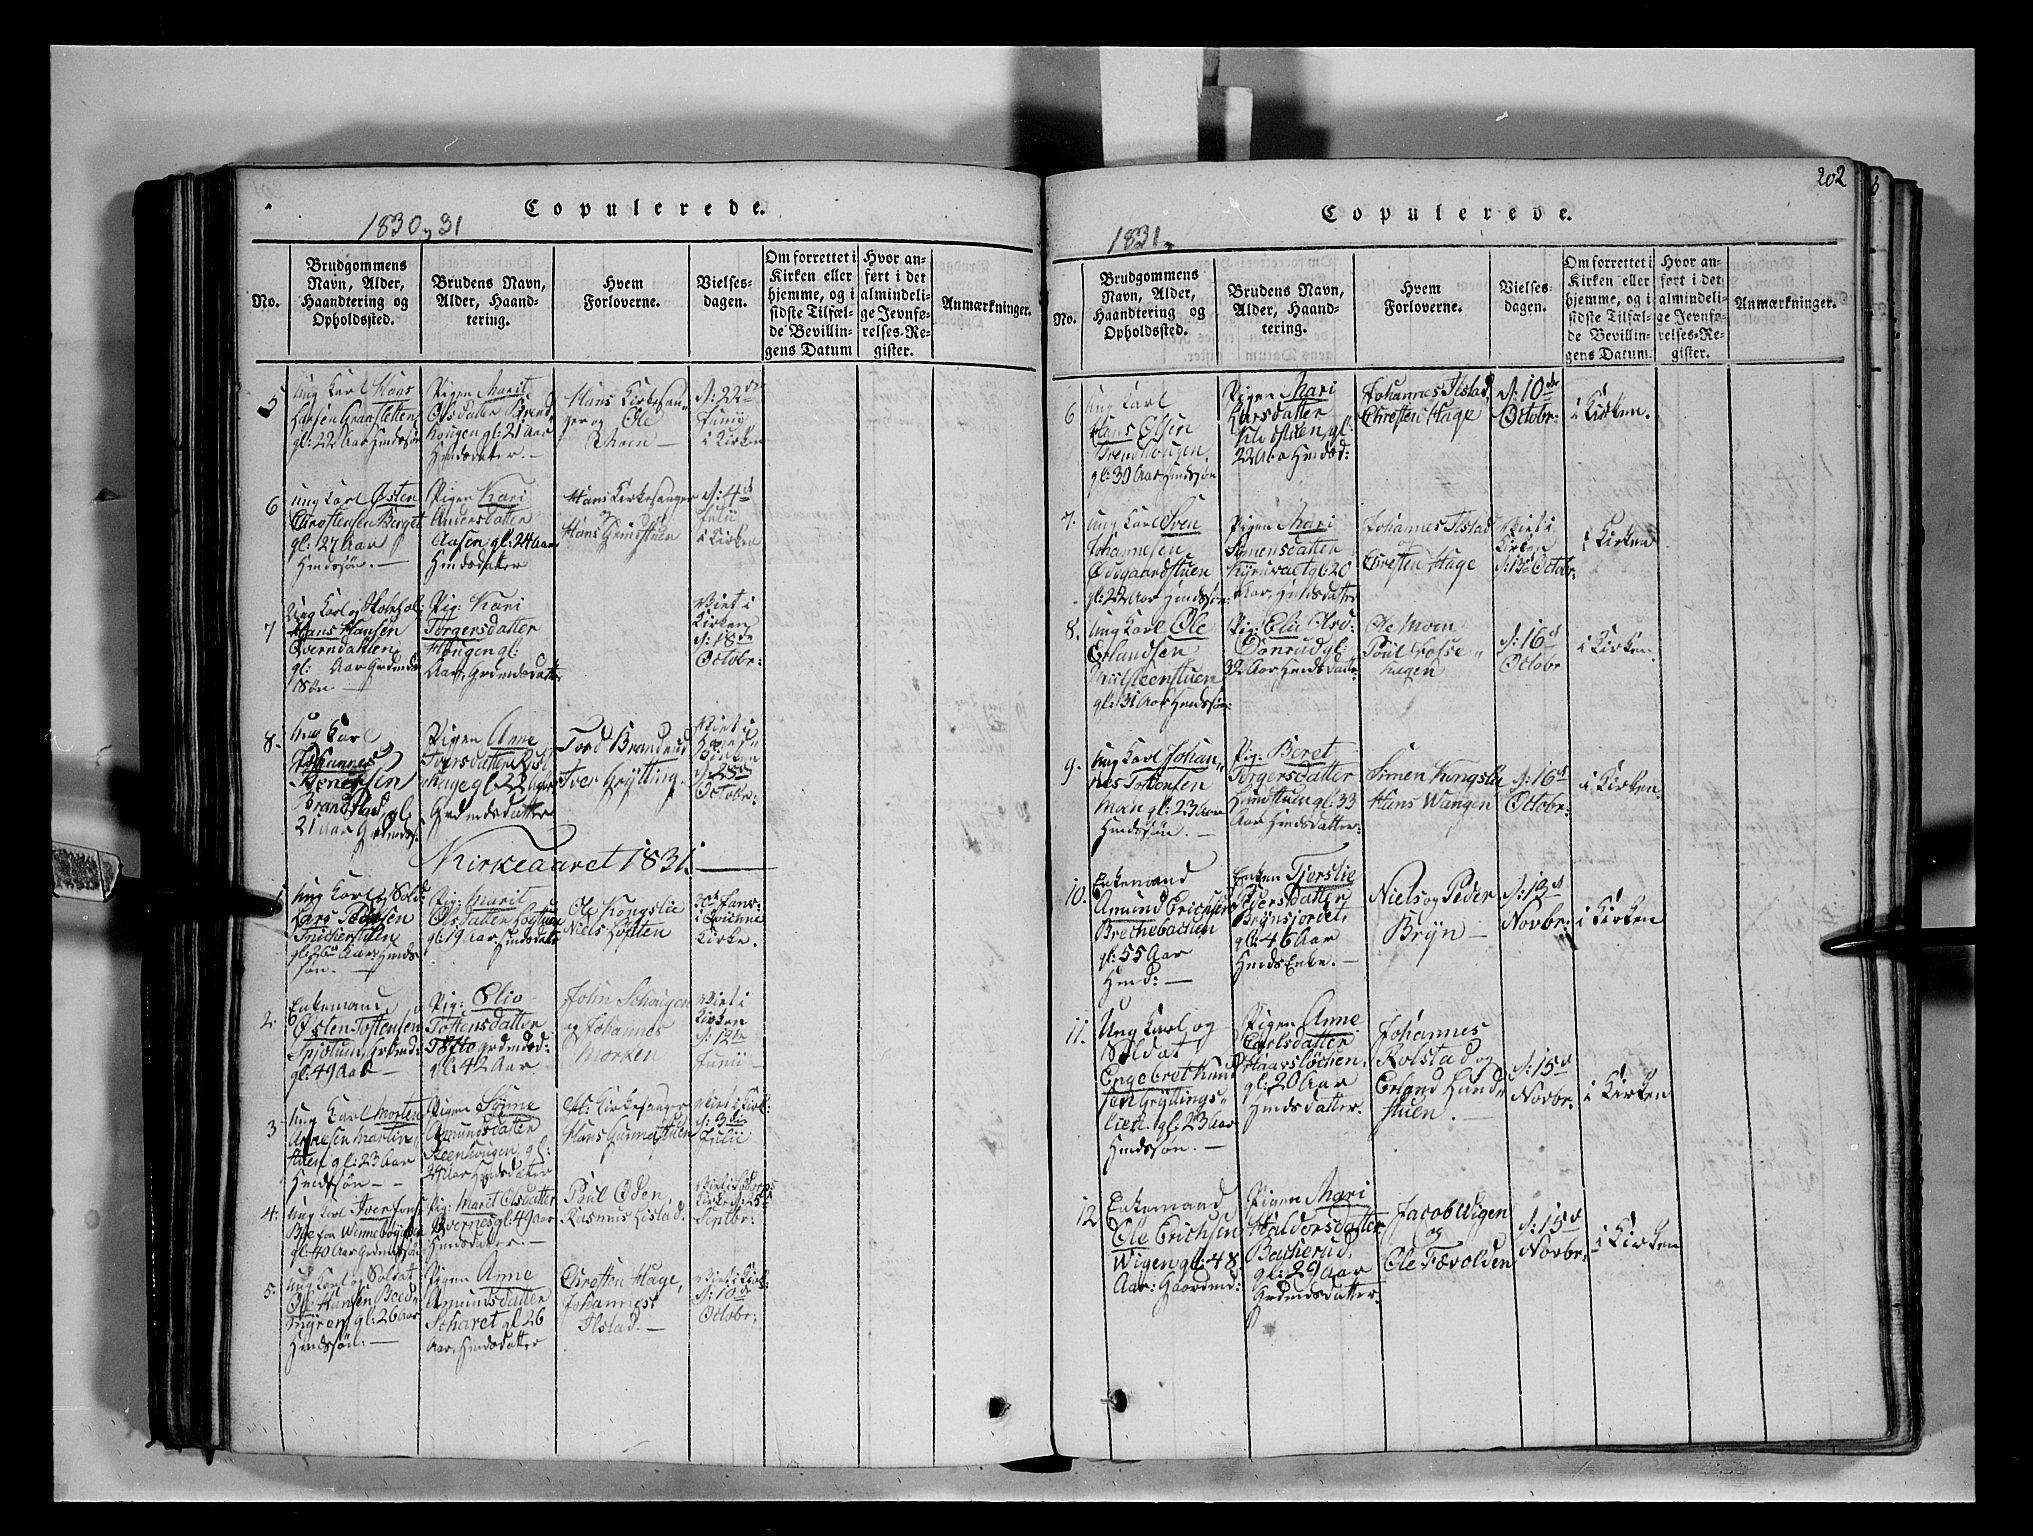 SAH, Fron prestekontor, H/Ha/Hab/L0004: Klokkerbok nr. 4, 1816-1850, s. 202